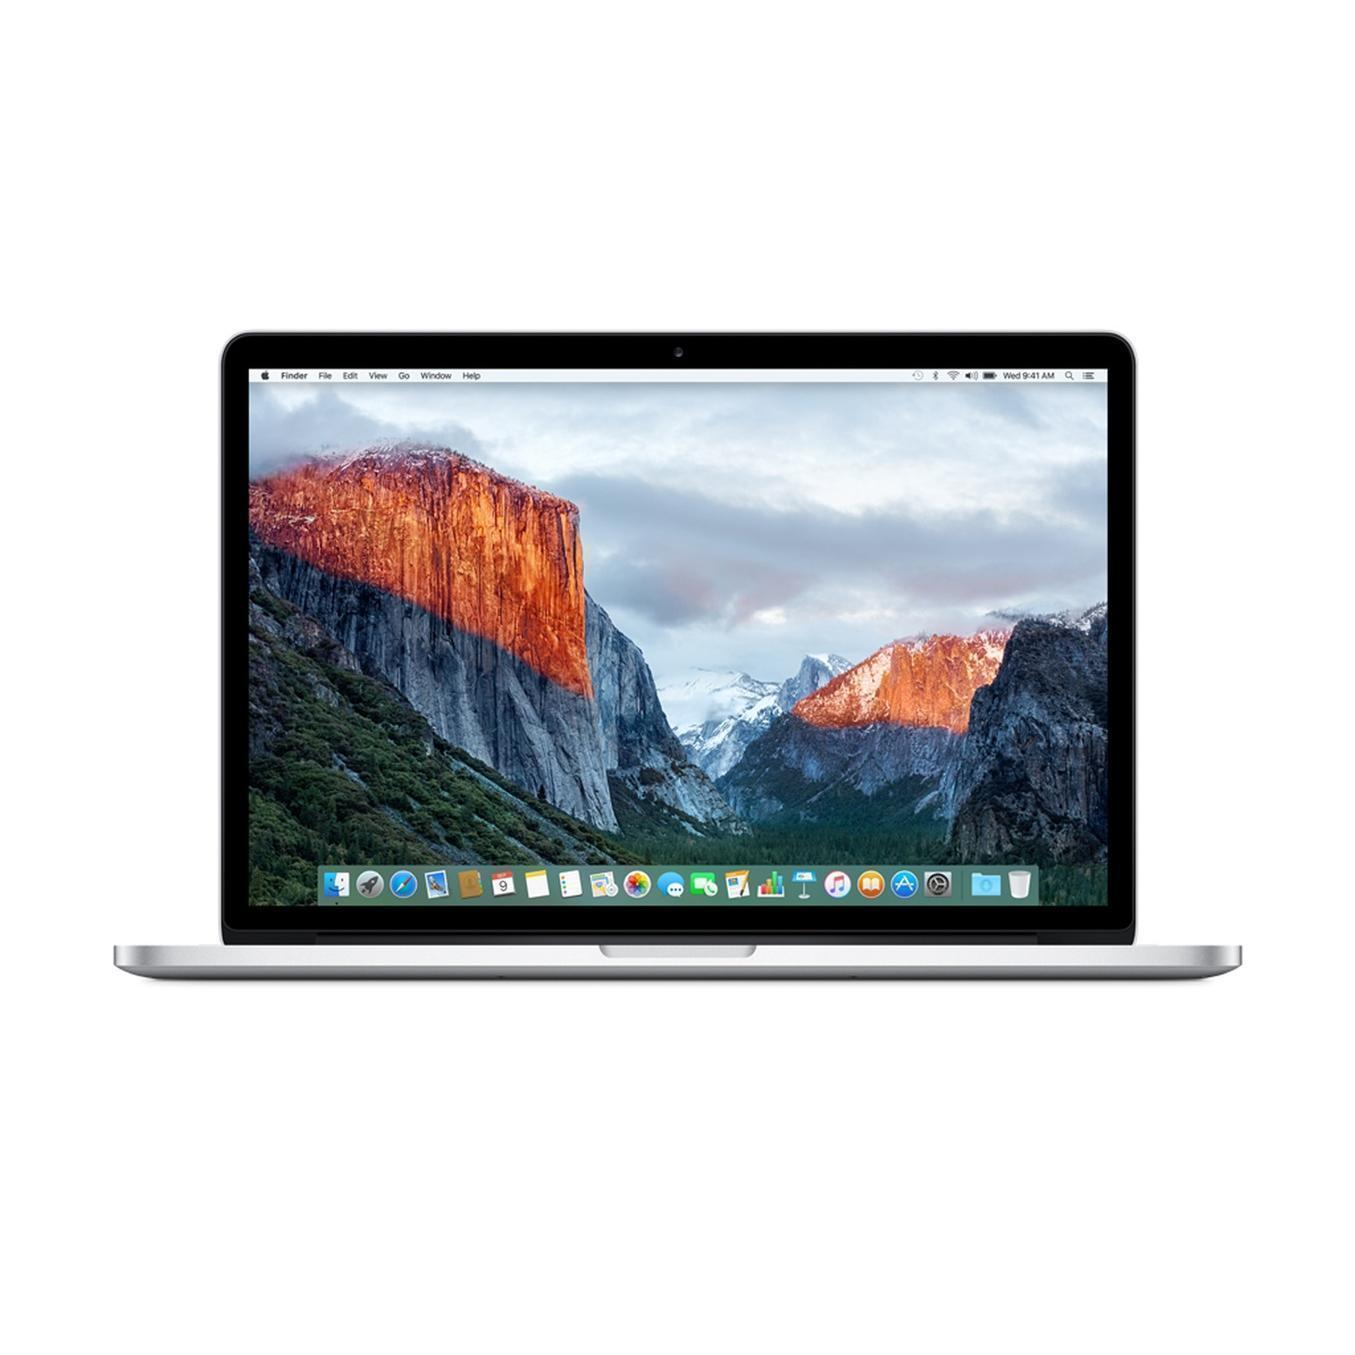 MacBook Pro Retina 15,4-tum (2012) - Core i7 - 16GB - SSD 256 GB QWERTY - Nederländska